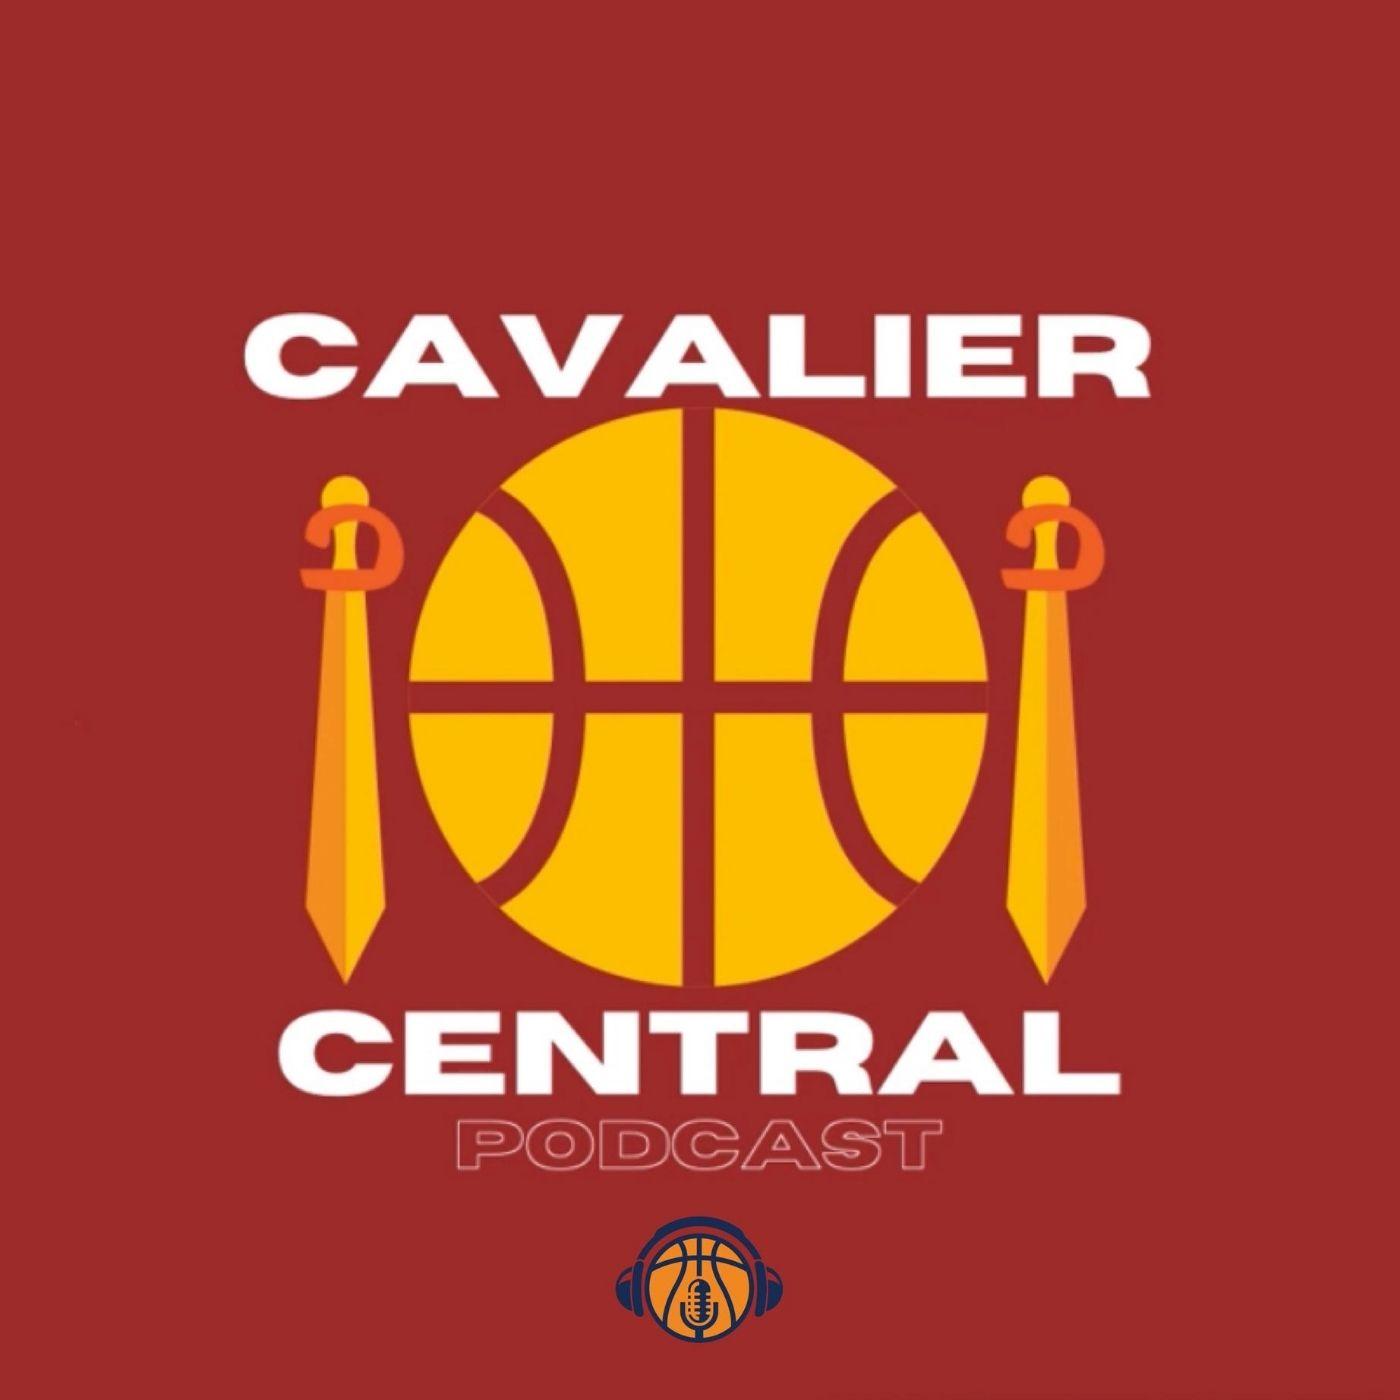 Show artwork for Cavalier Central